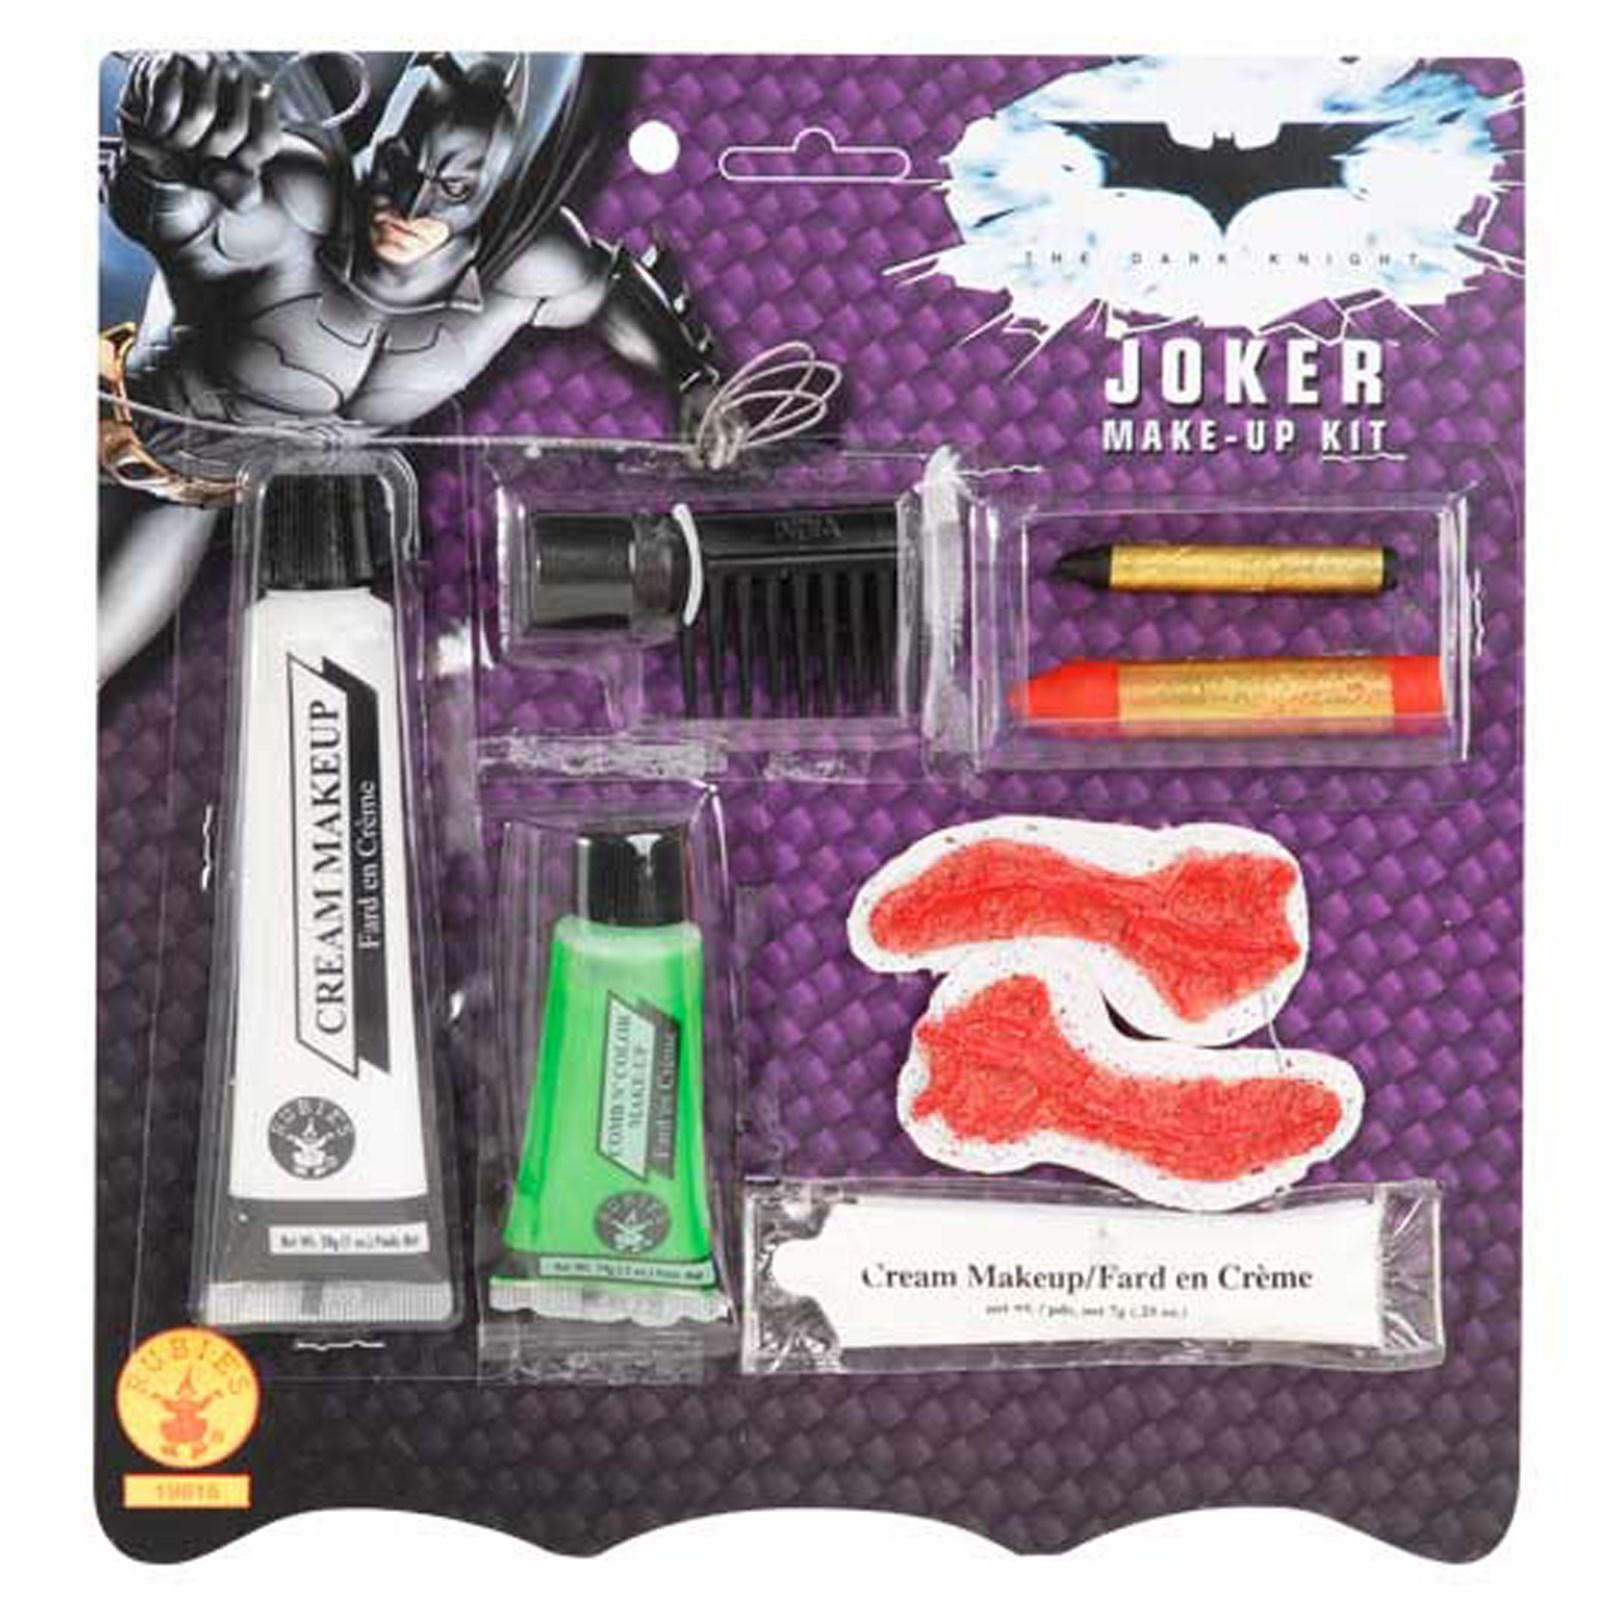 Image of Batman Dark Knight The Joker Makeup Kit